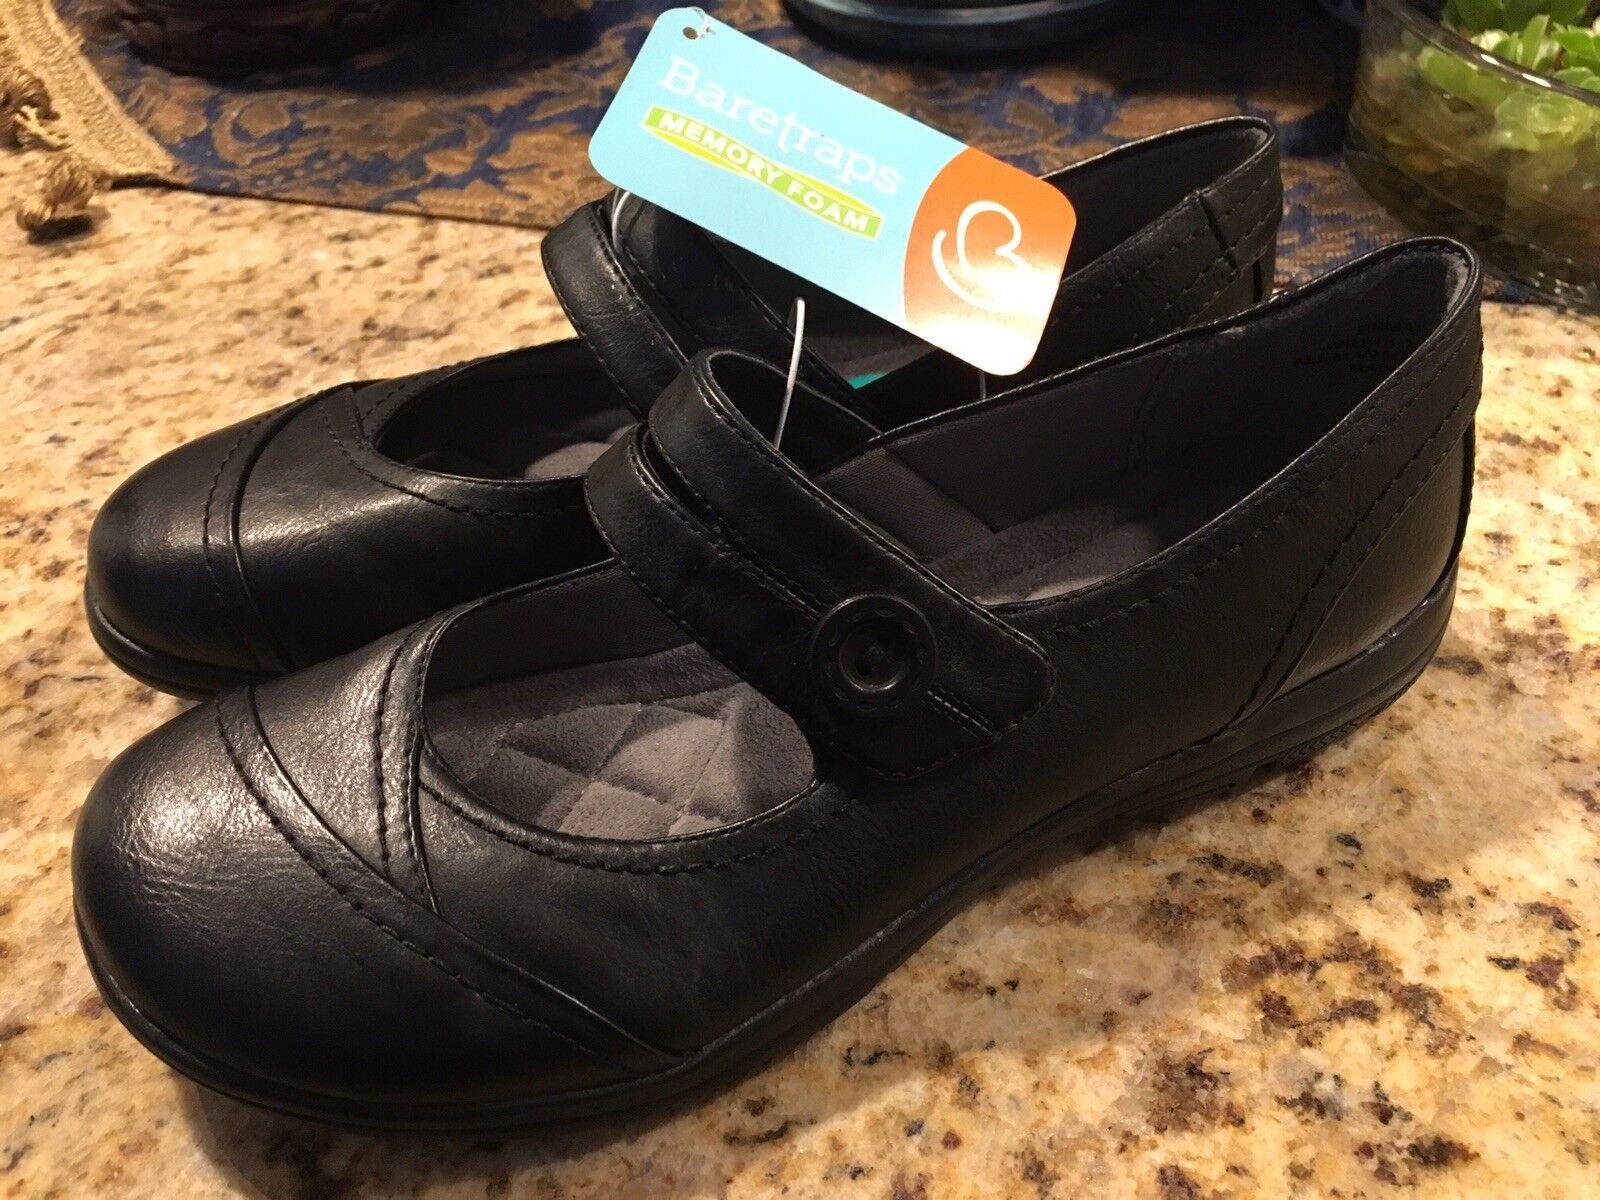 5de64c6b0e2e8 Women's Memory Foam Black Mary Jane shoes Double Strap sz 7.5, New ...